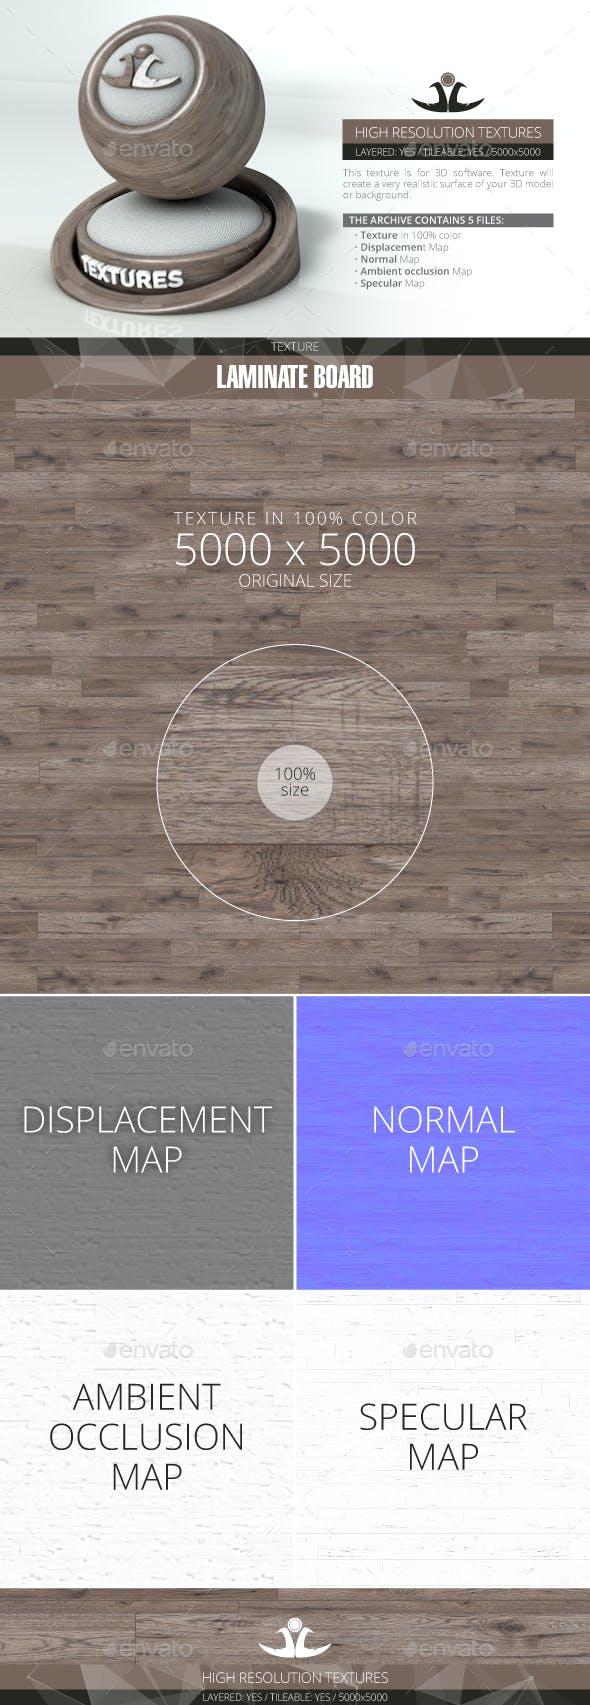 Laminate Board 55 - 3DOcean Item for Sale